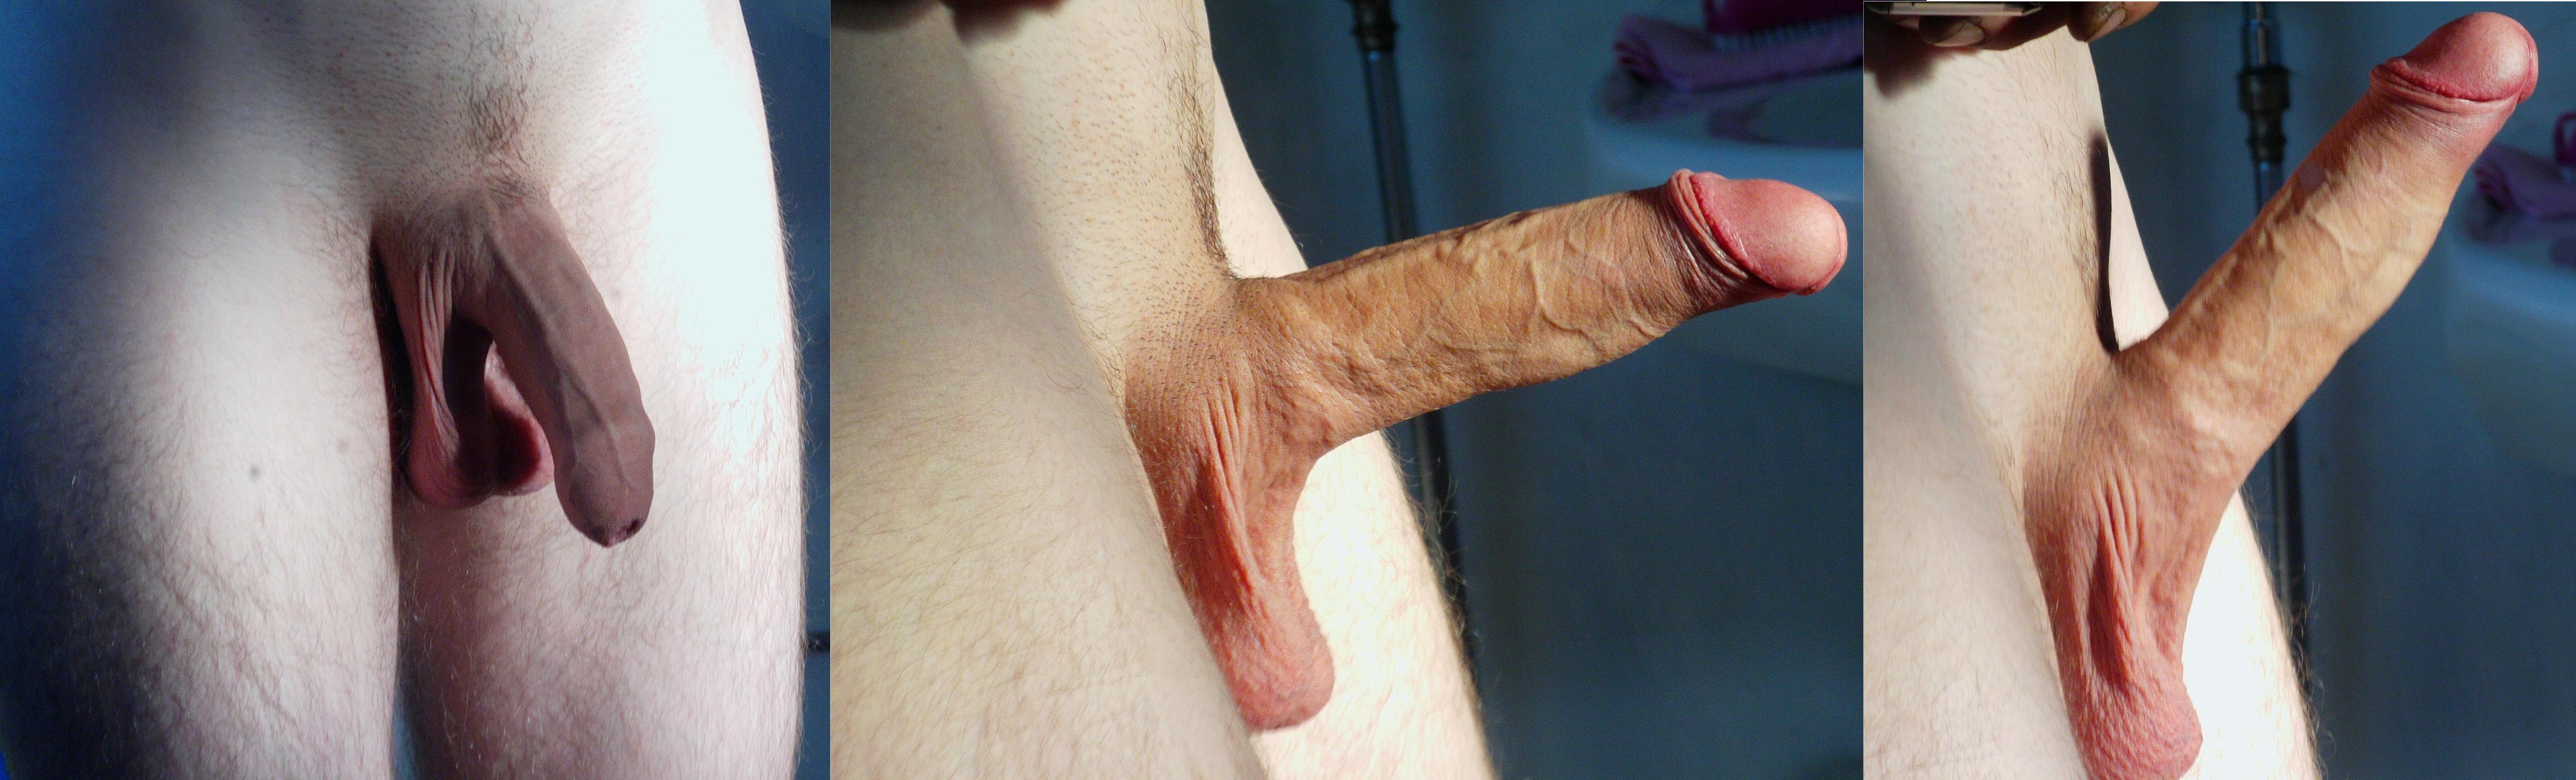 erektion penis bild